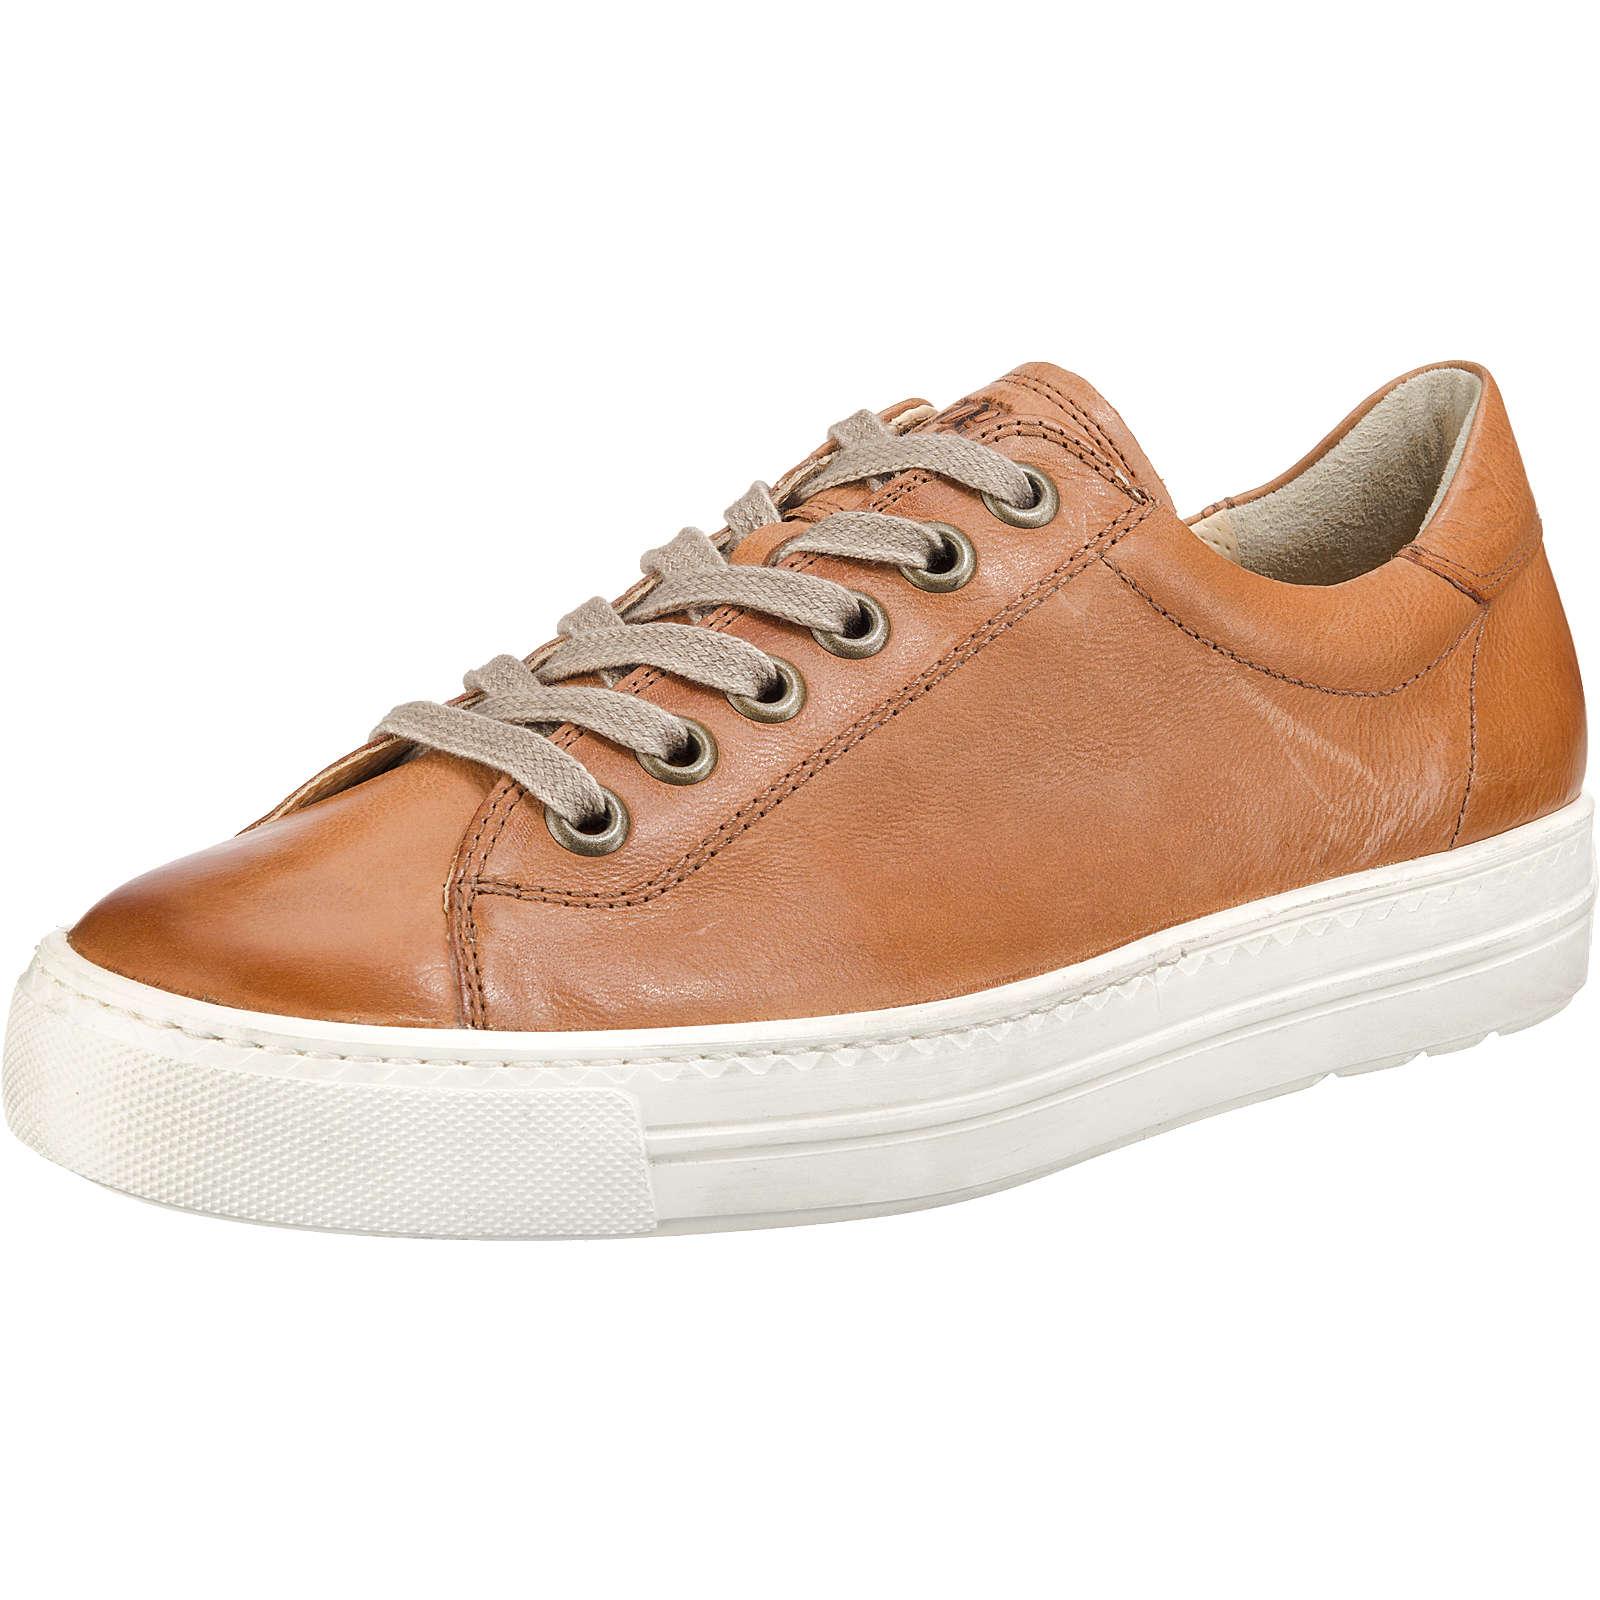 Paul Green Sneakers Low cognac Damen Gr. 39